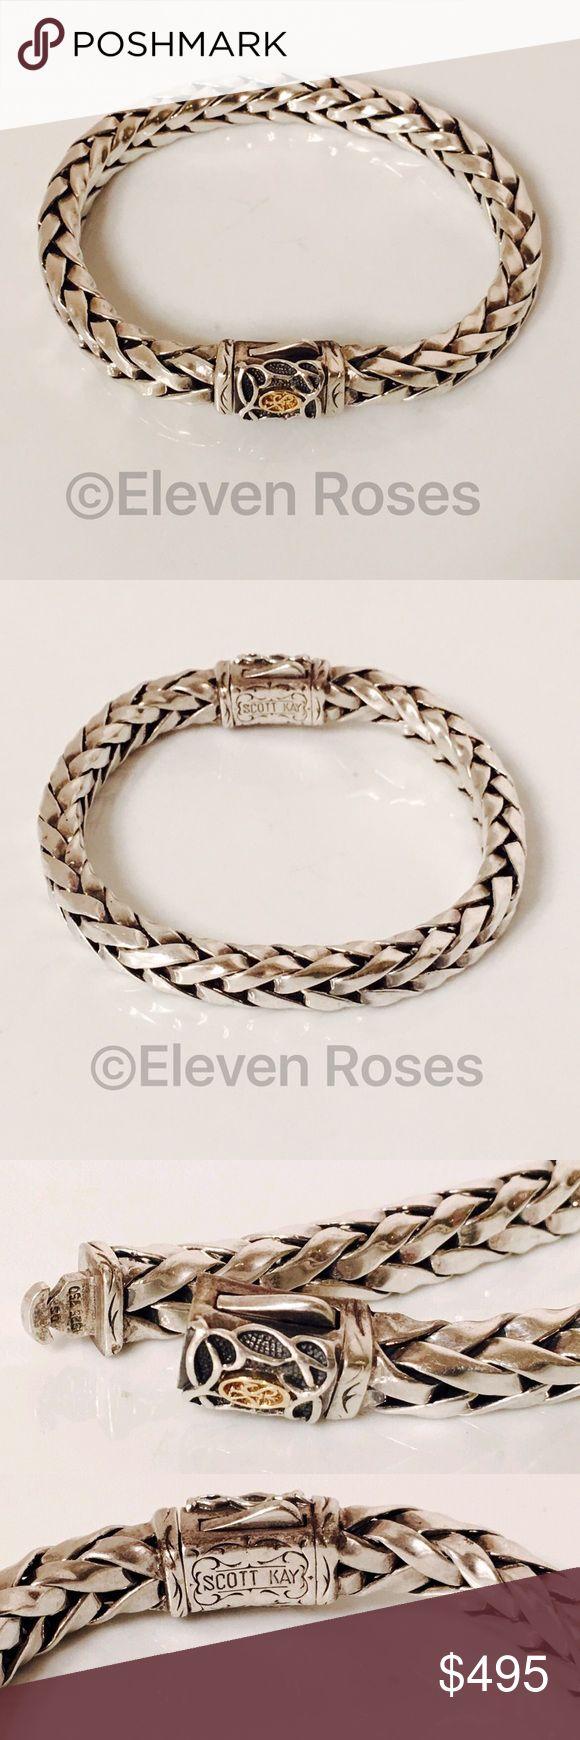 "Scott Kay Sterling & 18k Woven Chain Bracelet Scott Kay Heavy Woven Chain Bracelet - 925 Sterling Silver & 750 18k Gold - Measures Approx 7.5"" Long X 7.5mm Wide - Weighs Approx 54 Grams - Double Push Button Clasp Scott Kay Jewelry Bracelets"